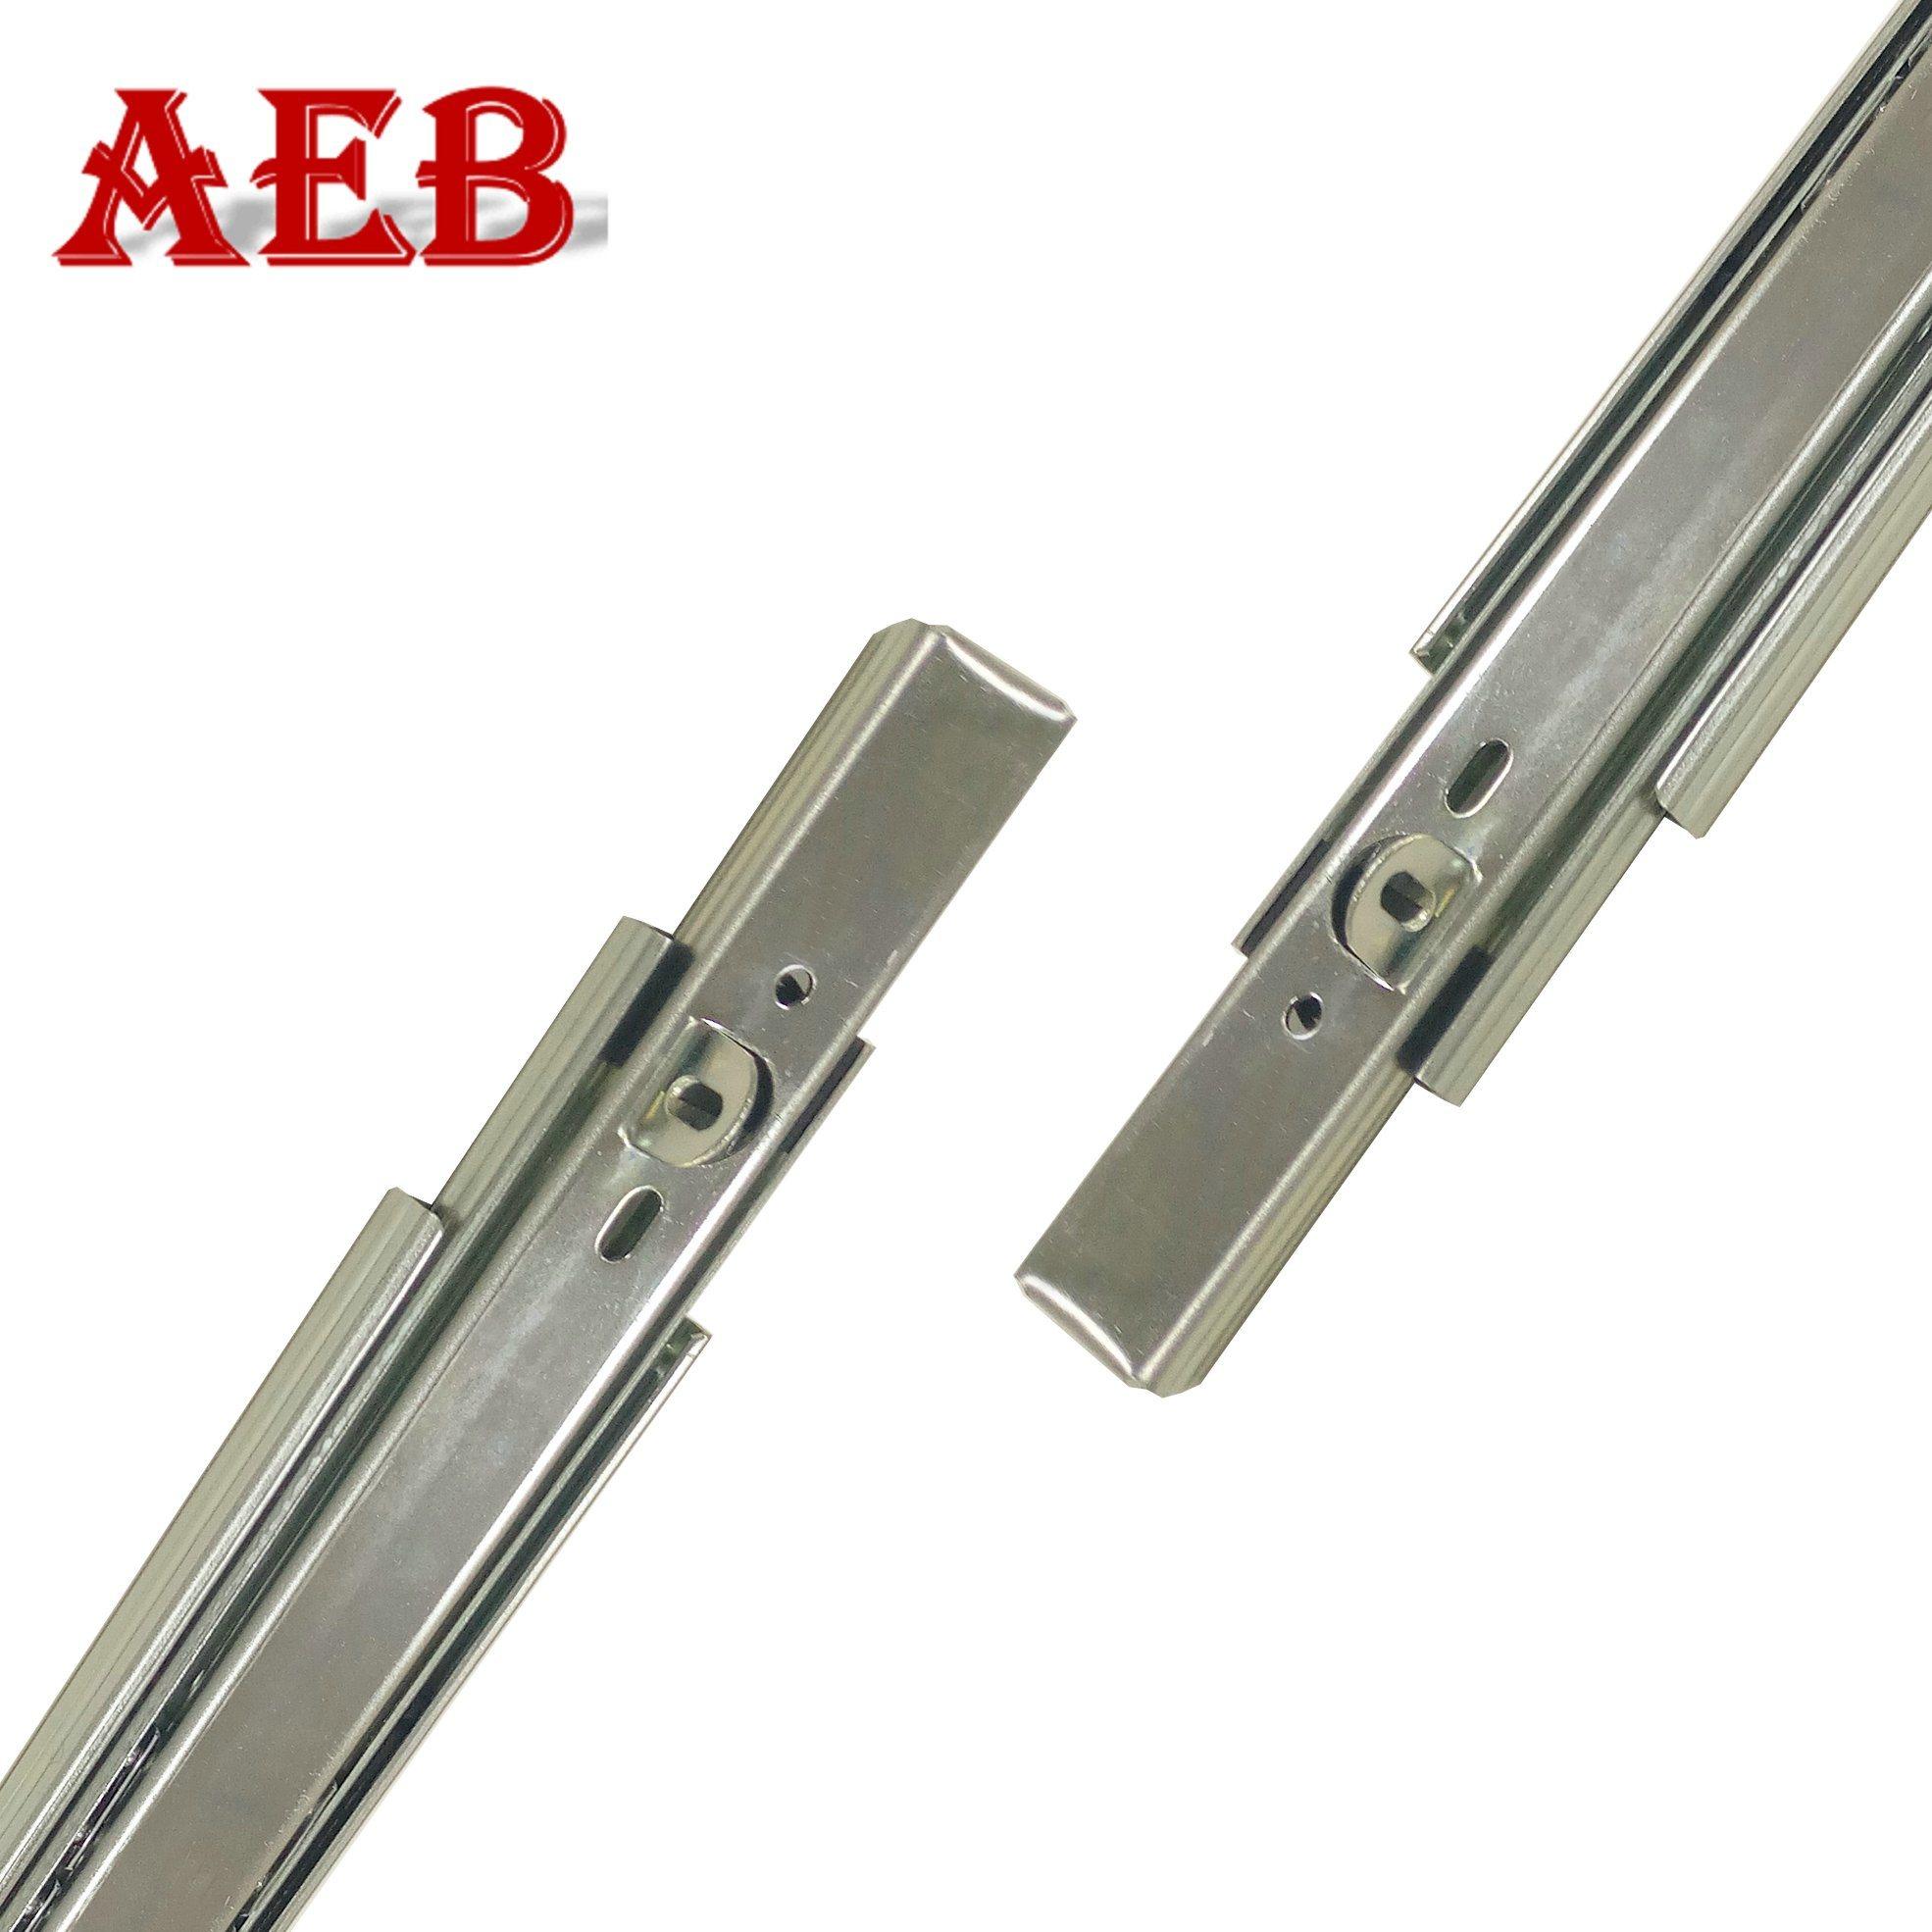 hardware drawers channel sliding china drawer installing nszjmhfjgpcg product folds ball bearing vertical rail furniture slides slide